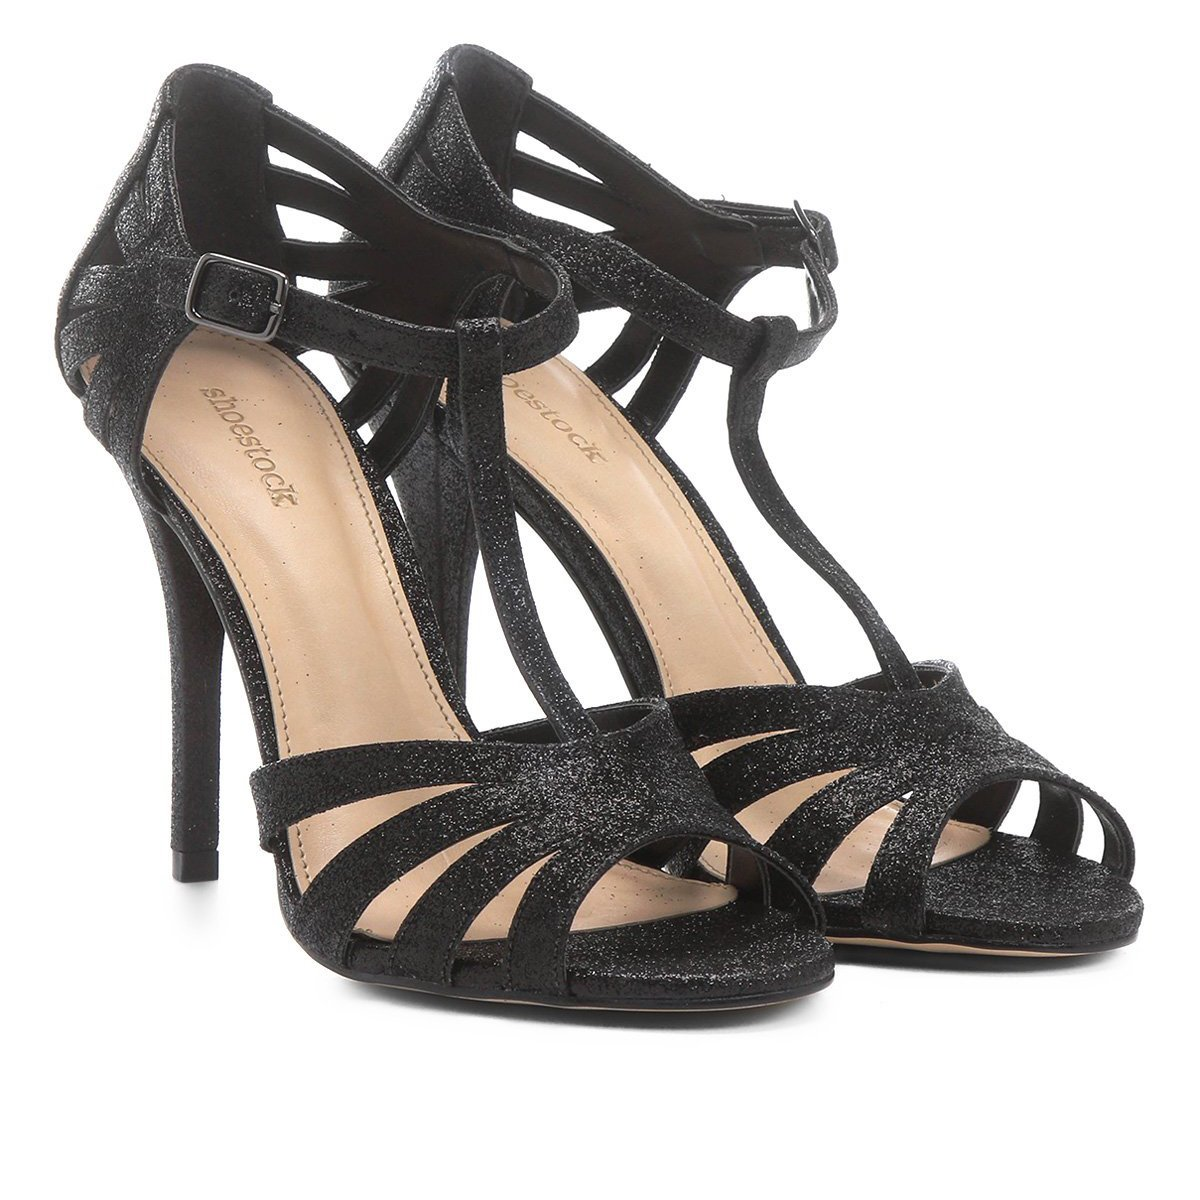 07292ac9f5 Sandália Shoestock Salto Fino Shine Feminina